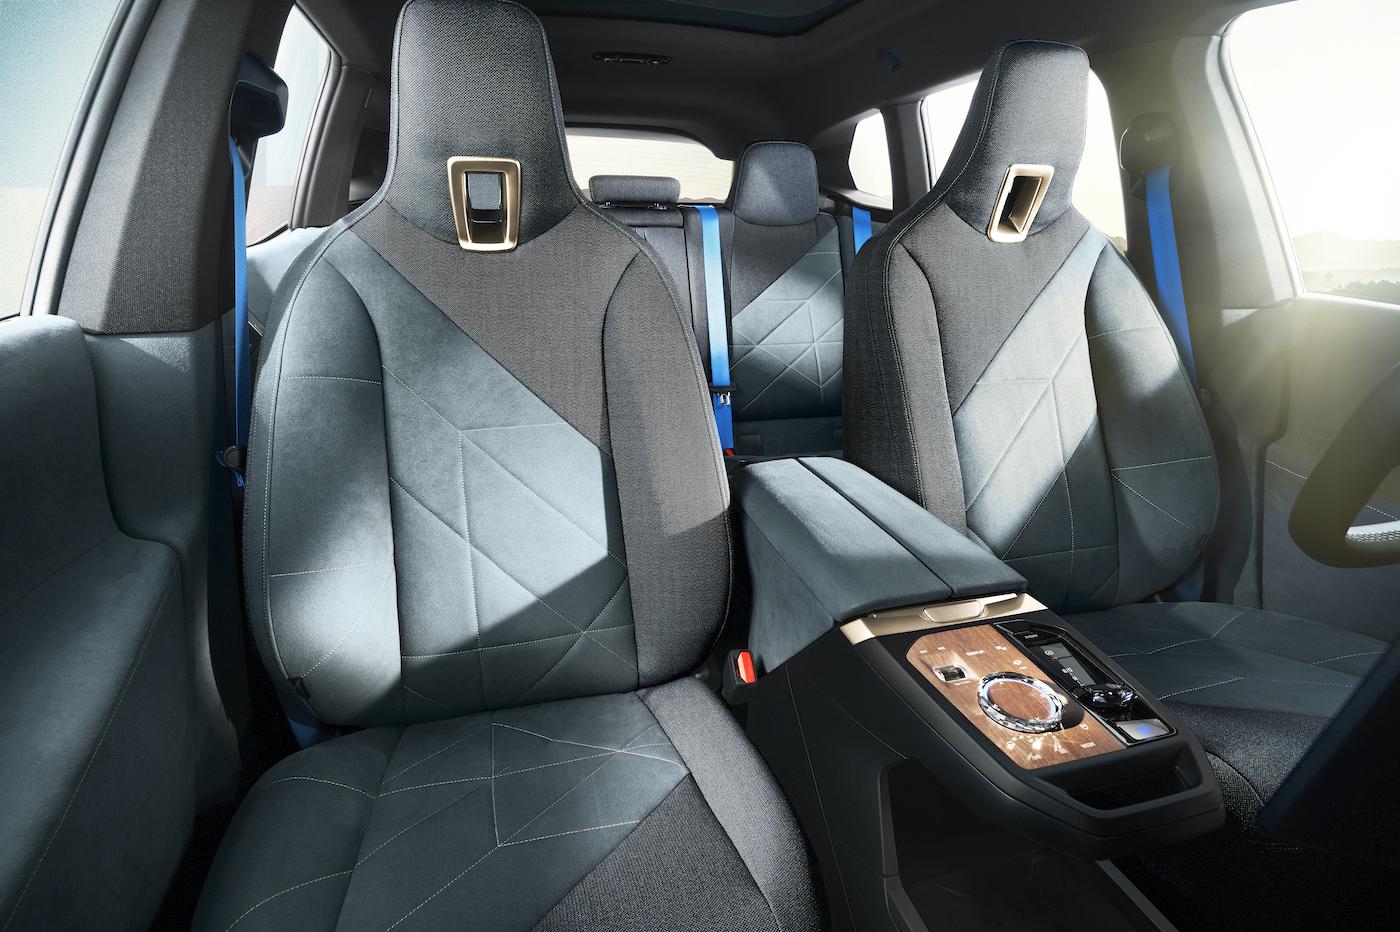 2021 BMW iX SUV habitacle